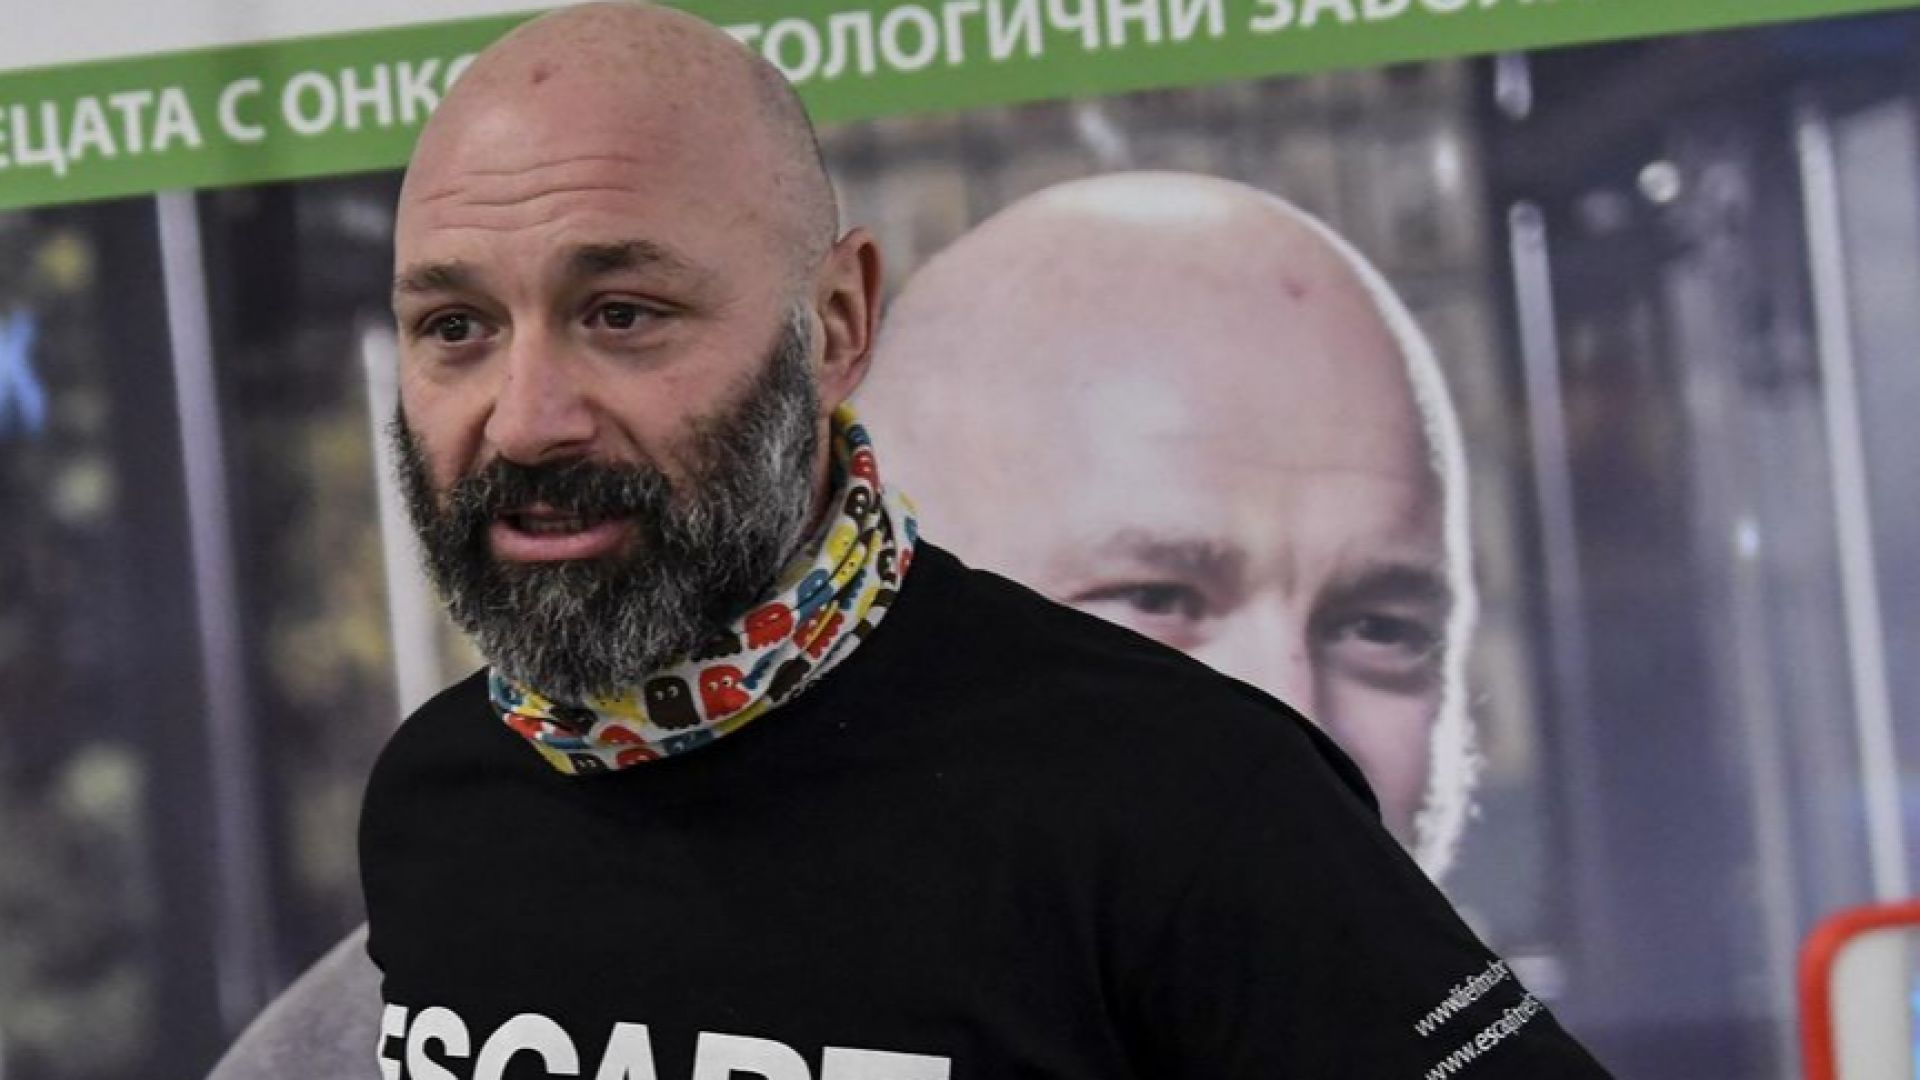 Ултрамаратонецът Красимир Георгиев ще тича без прекъсване 55 часа на